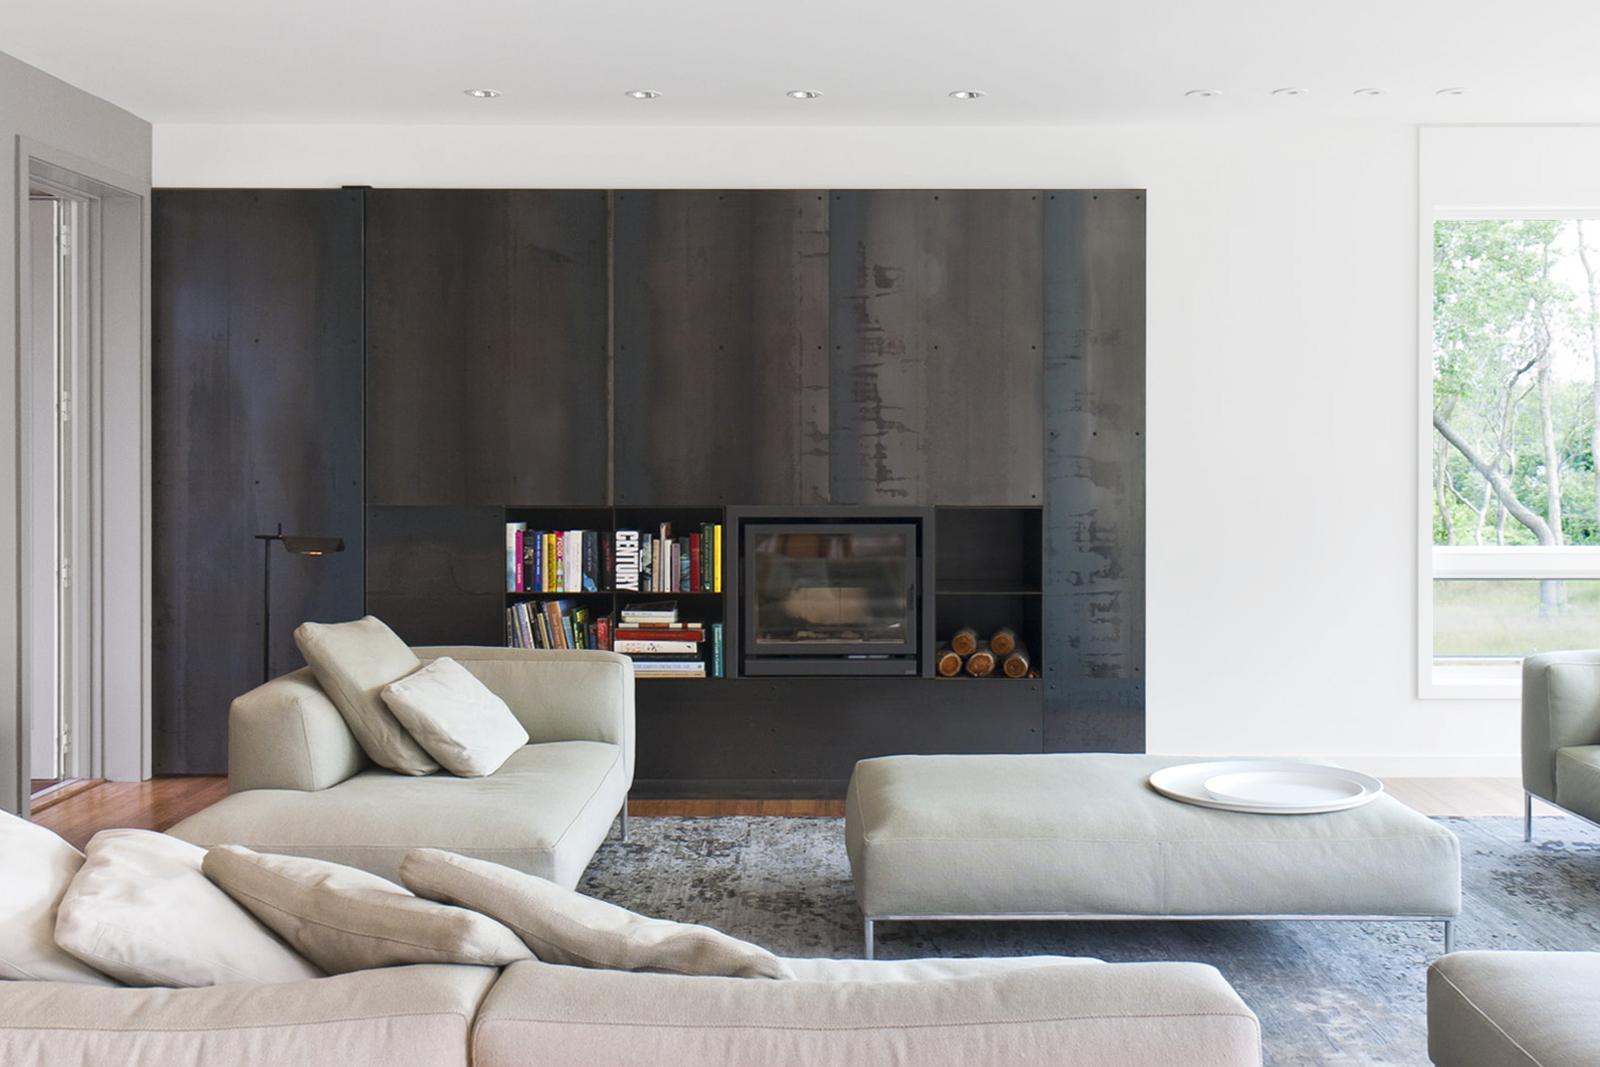 09-res4-resolution-4-architecture-modern-modular-home-prefab-house-fishers-island-interior-living-room.jpg